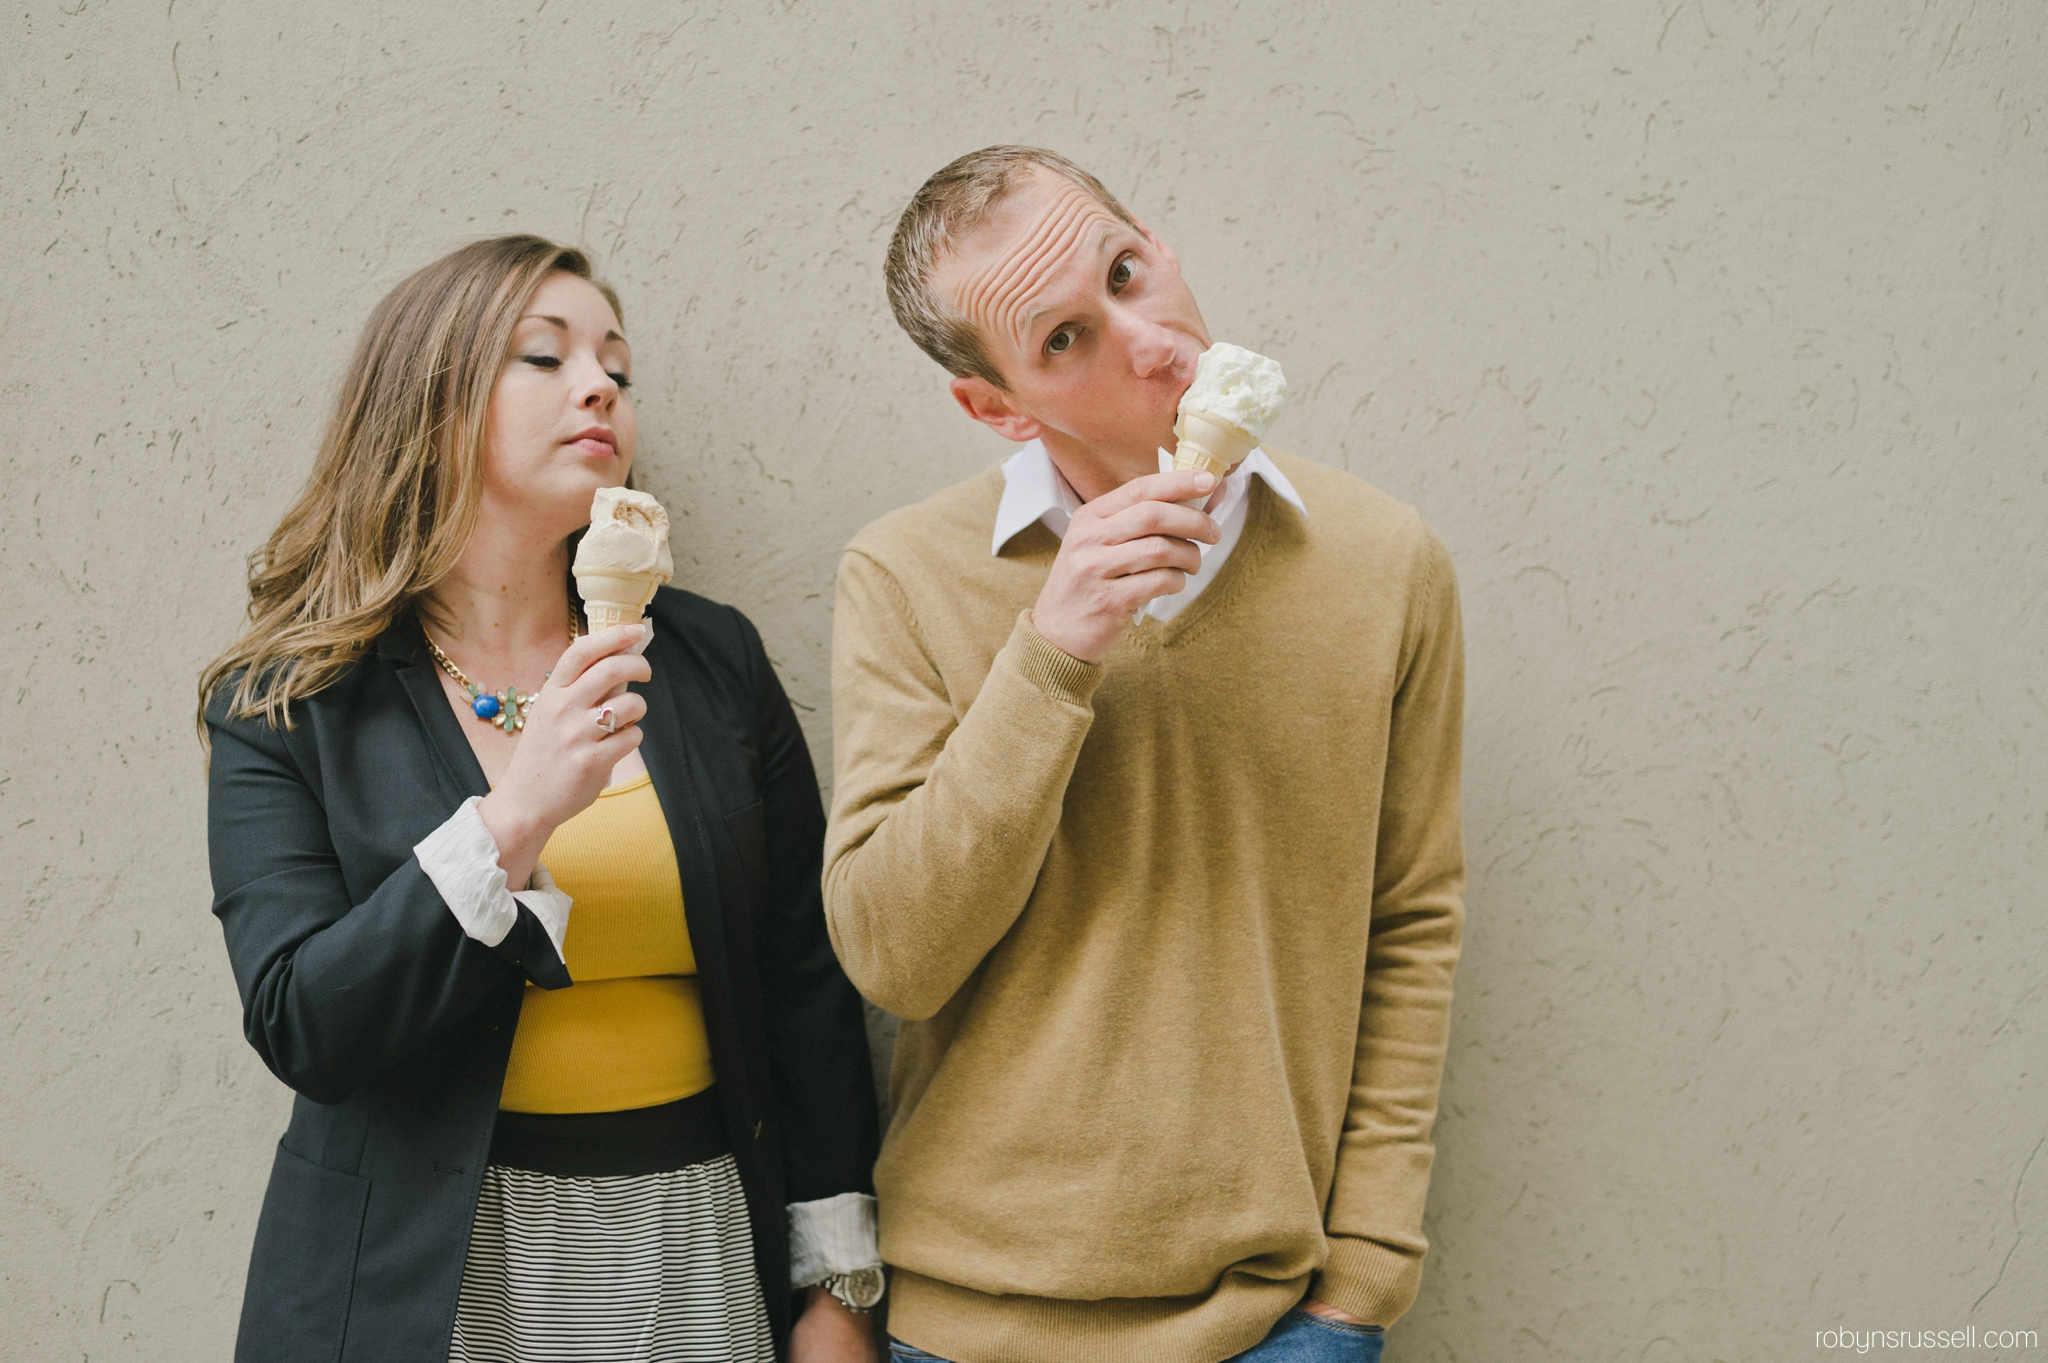 13-ice-cream-fun-during-engagement-session.jpg